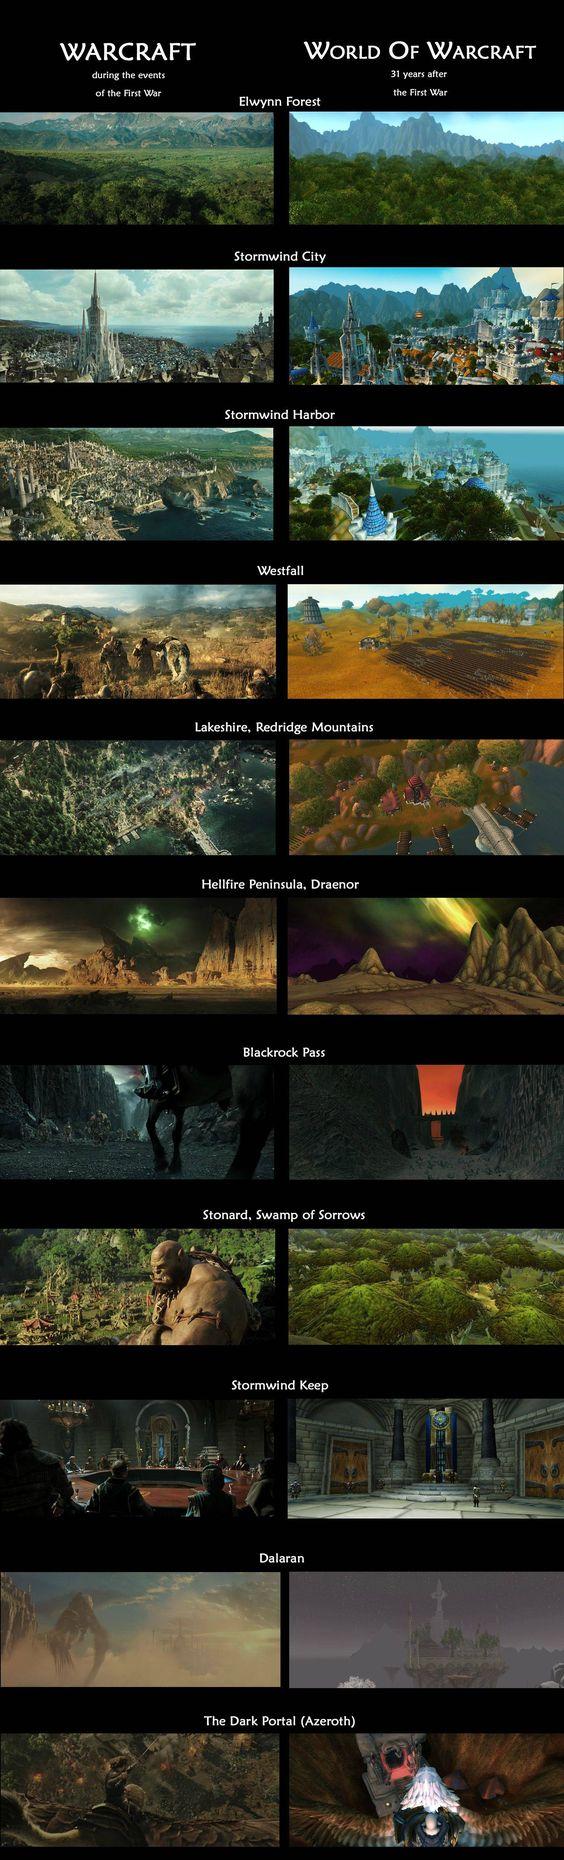 Warcraft Movie vs World of Warcraft Locations, In Screenshots